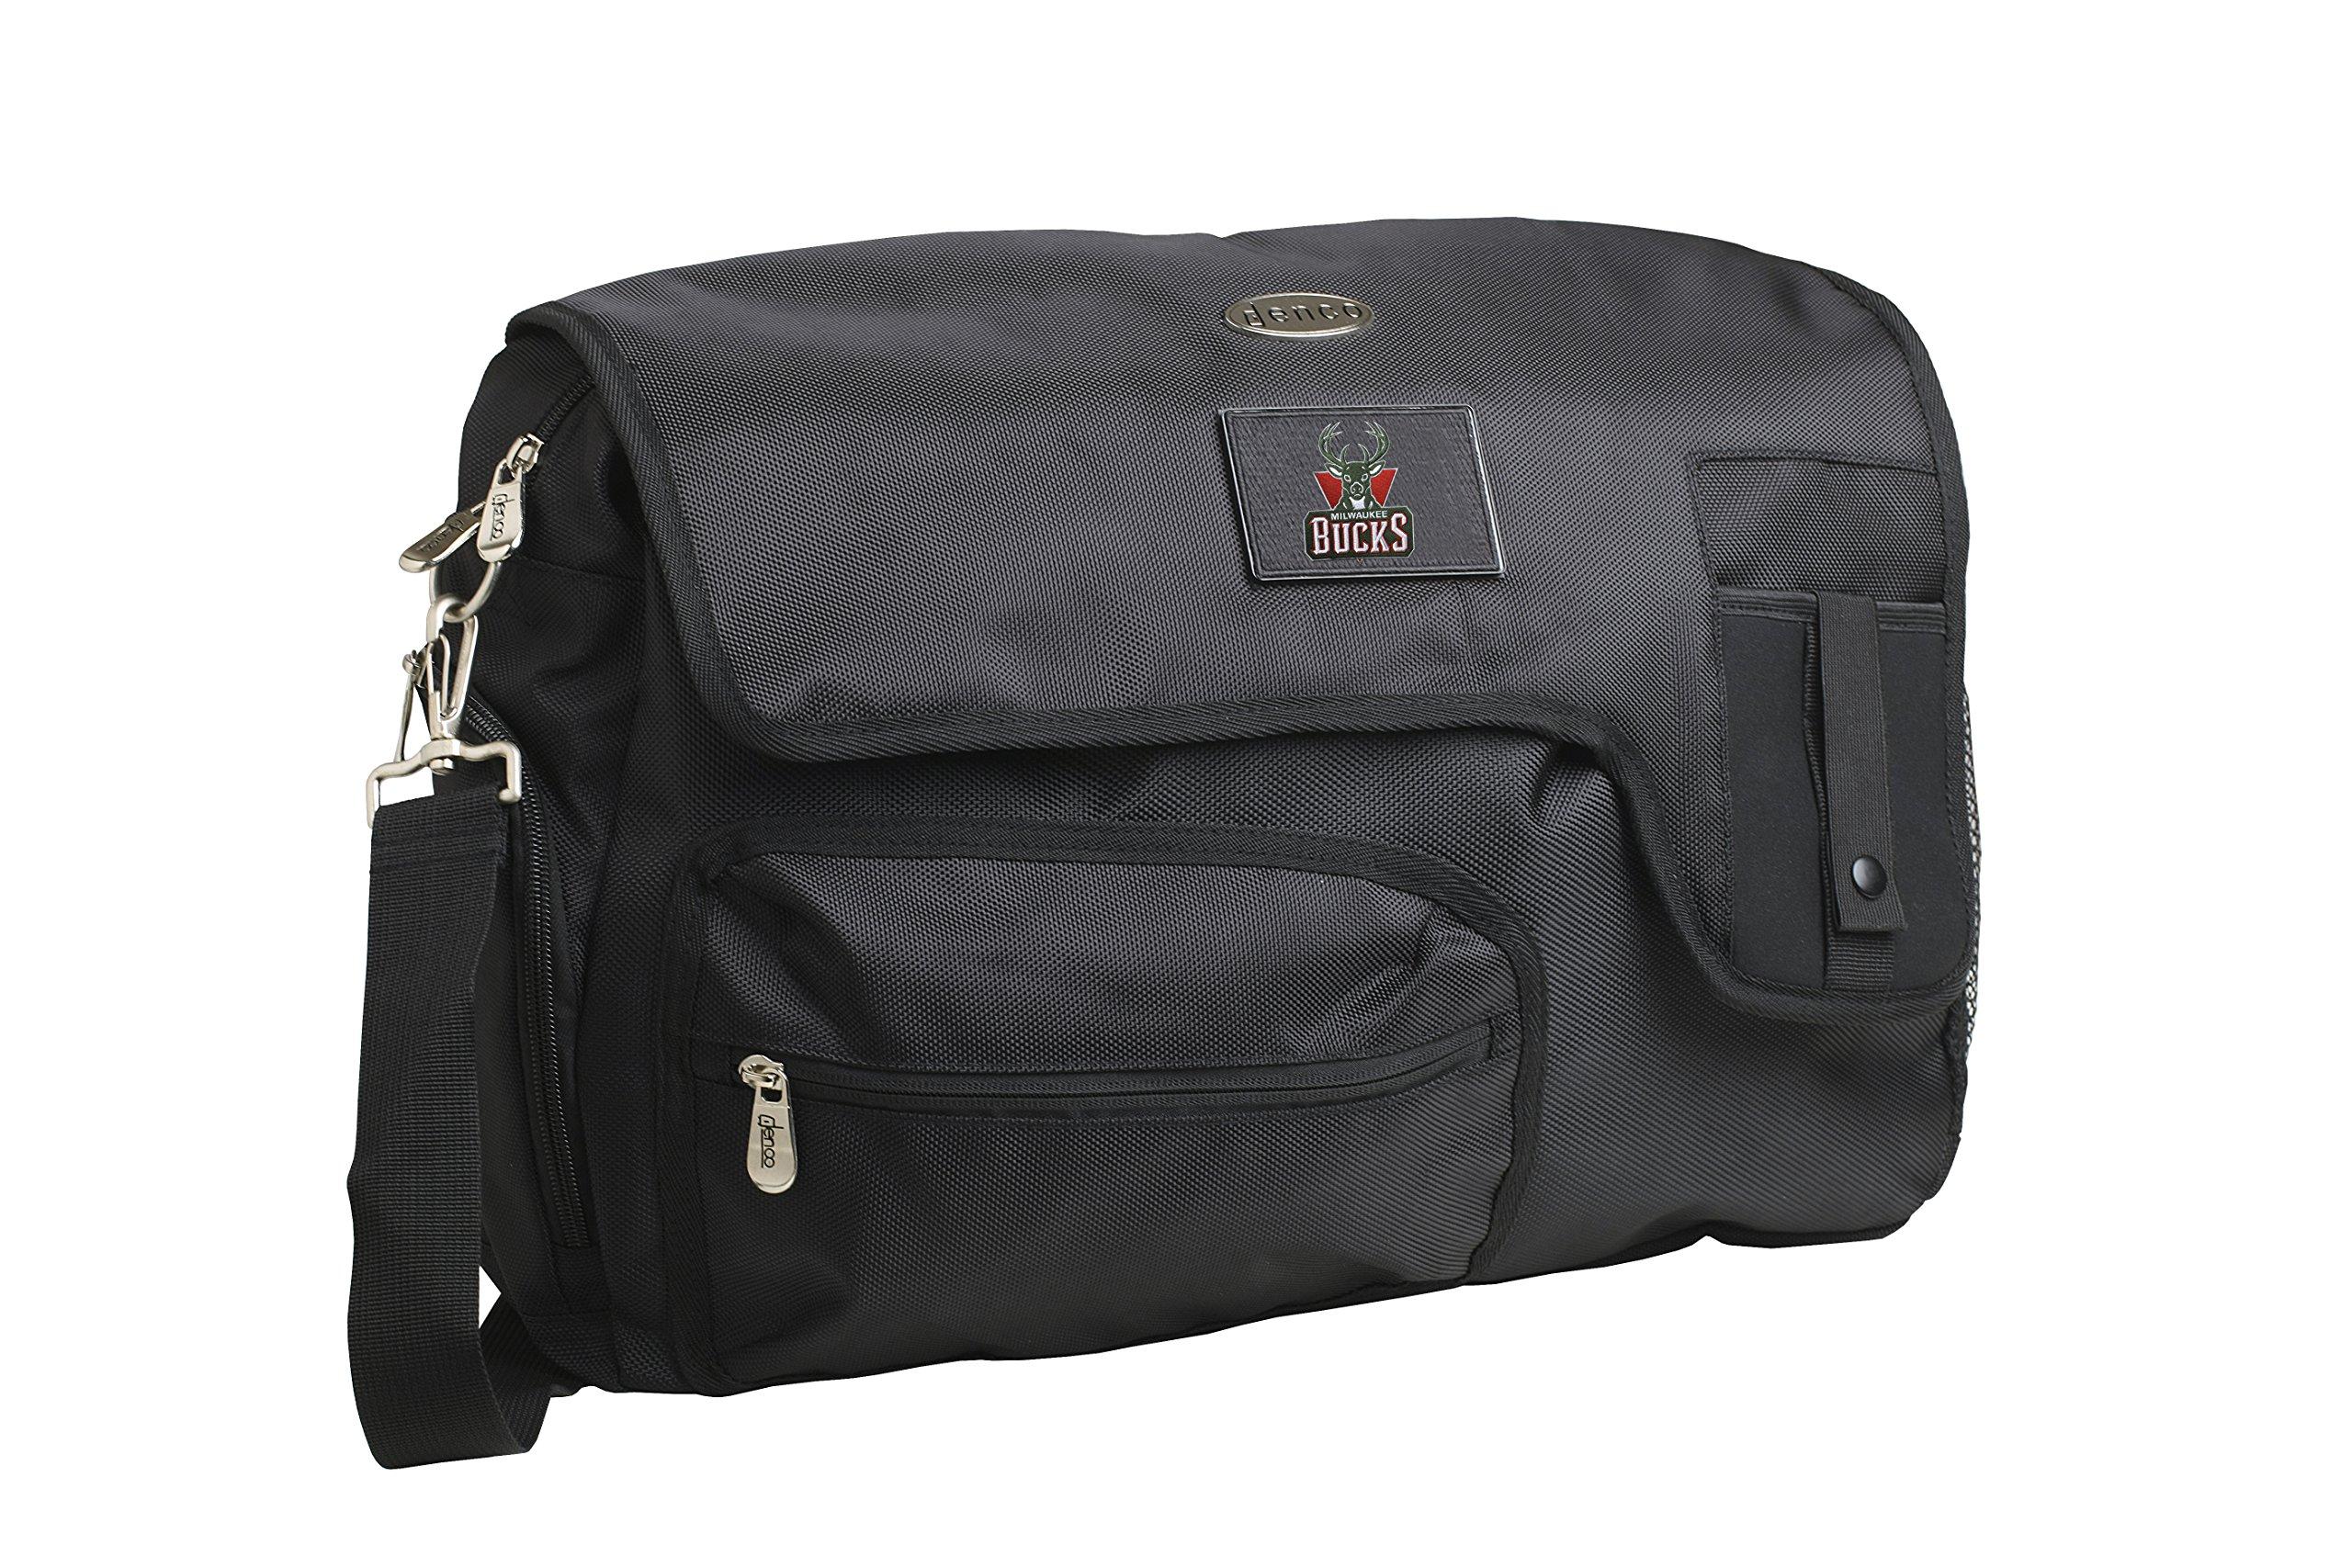 NBA Milwaukee Bucks Travel Messenger Bag, 15-Inch, Black by Denco